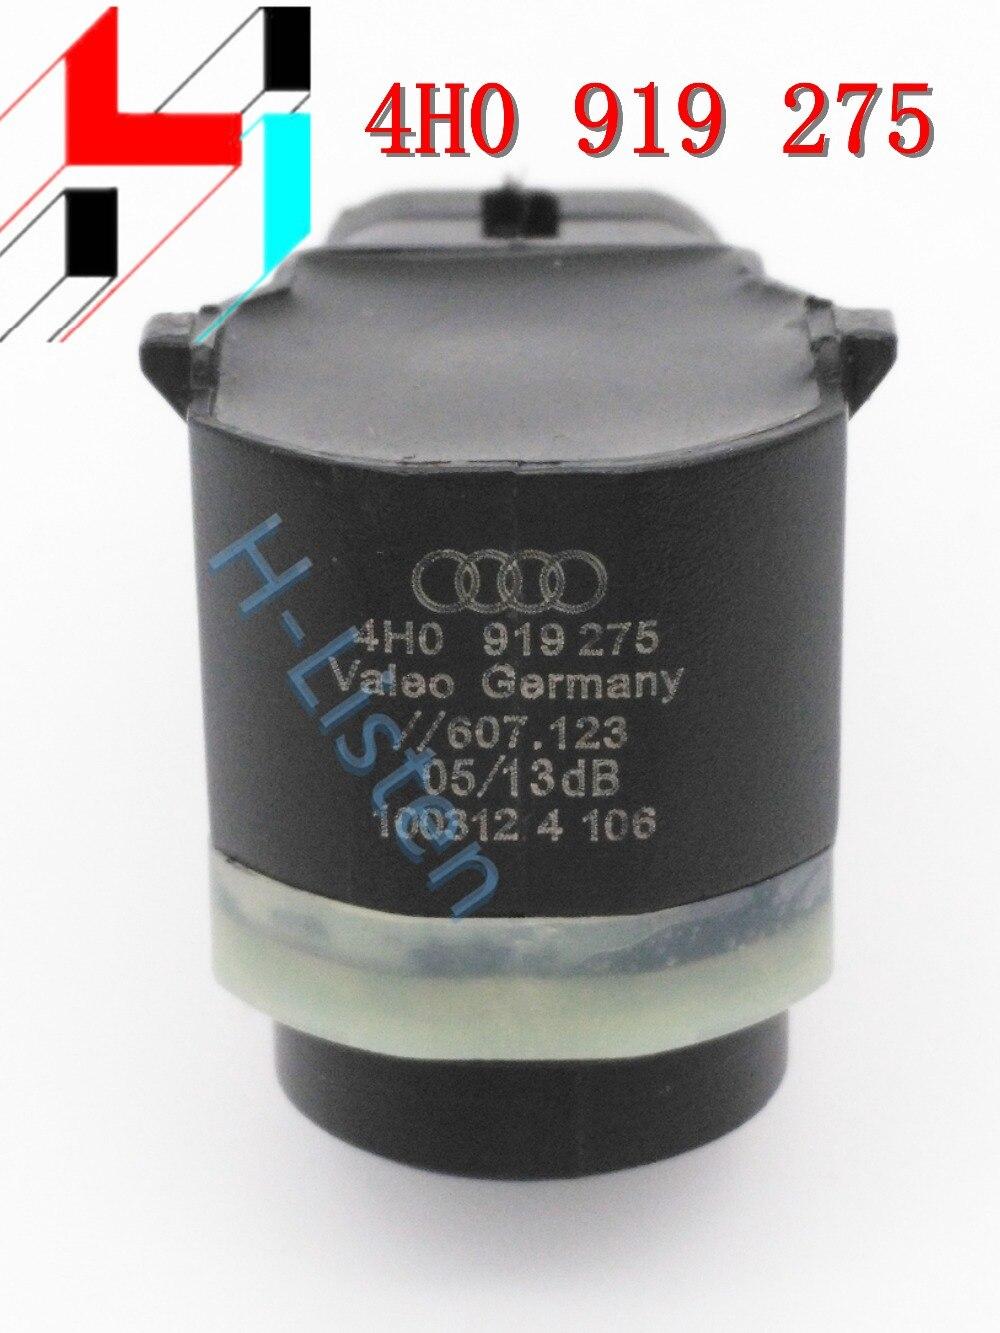 4pcs Parking PDC Sensor 4H0919275 Reversing Radar For V W Skoda Seat 4H0919275 3C0919275S 5KD919275